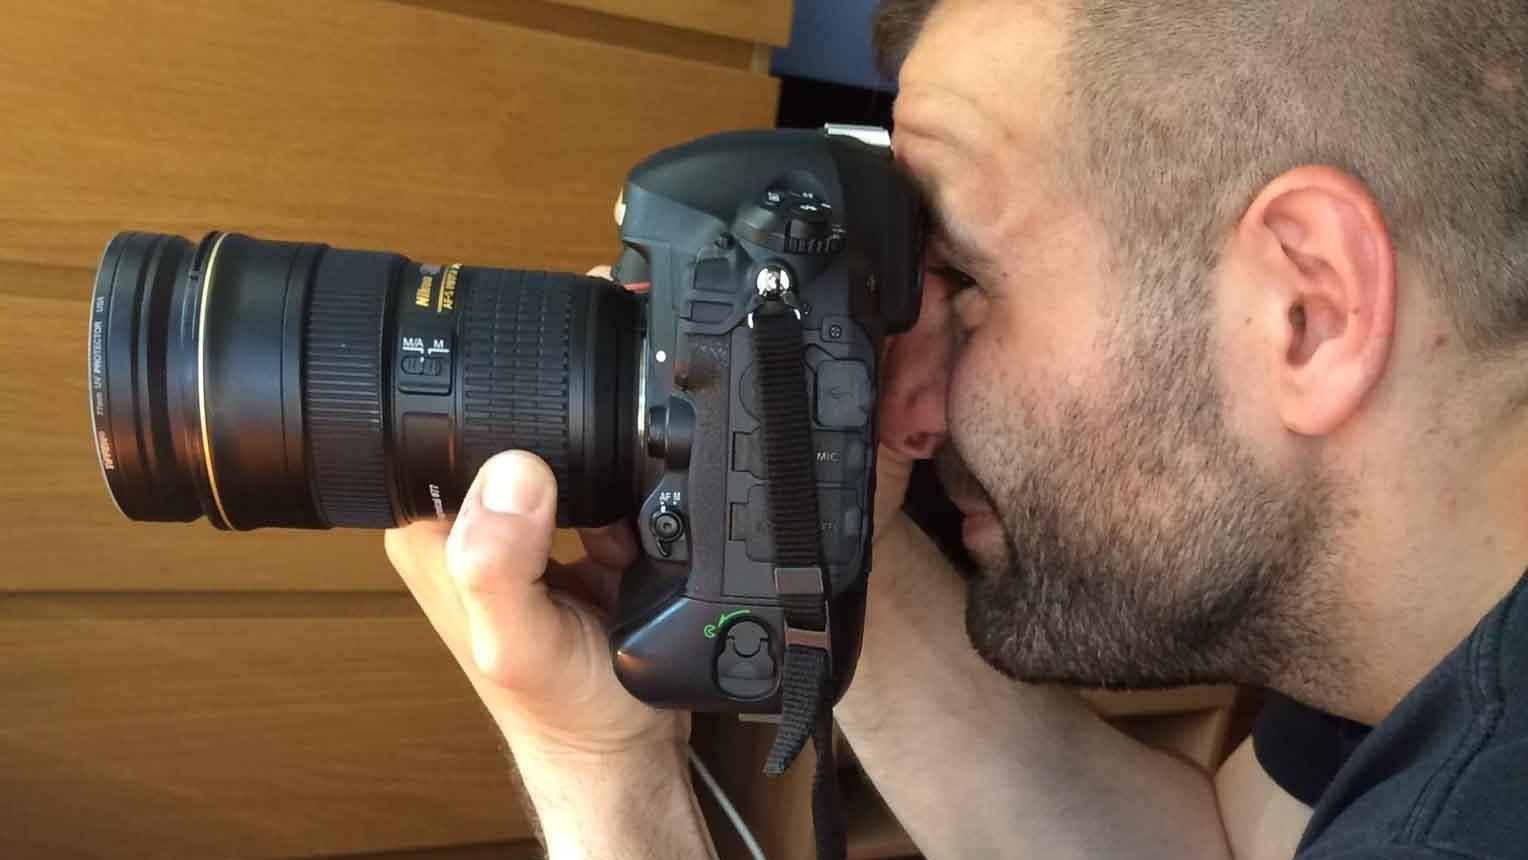 NYC branded lifestyle portrait photographer John DeMato Production with Nikon D4